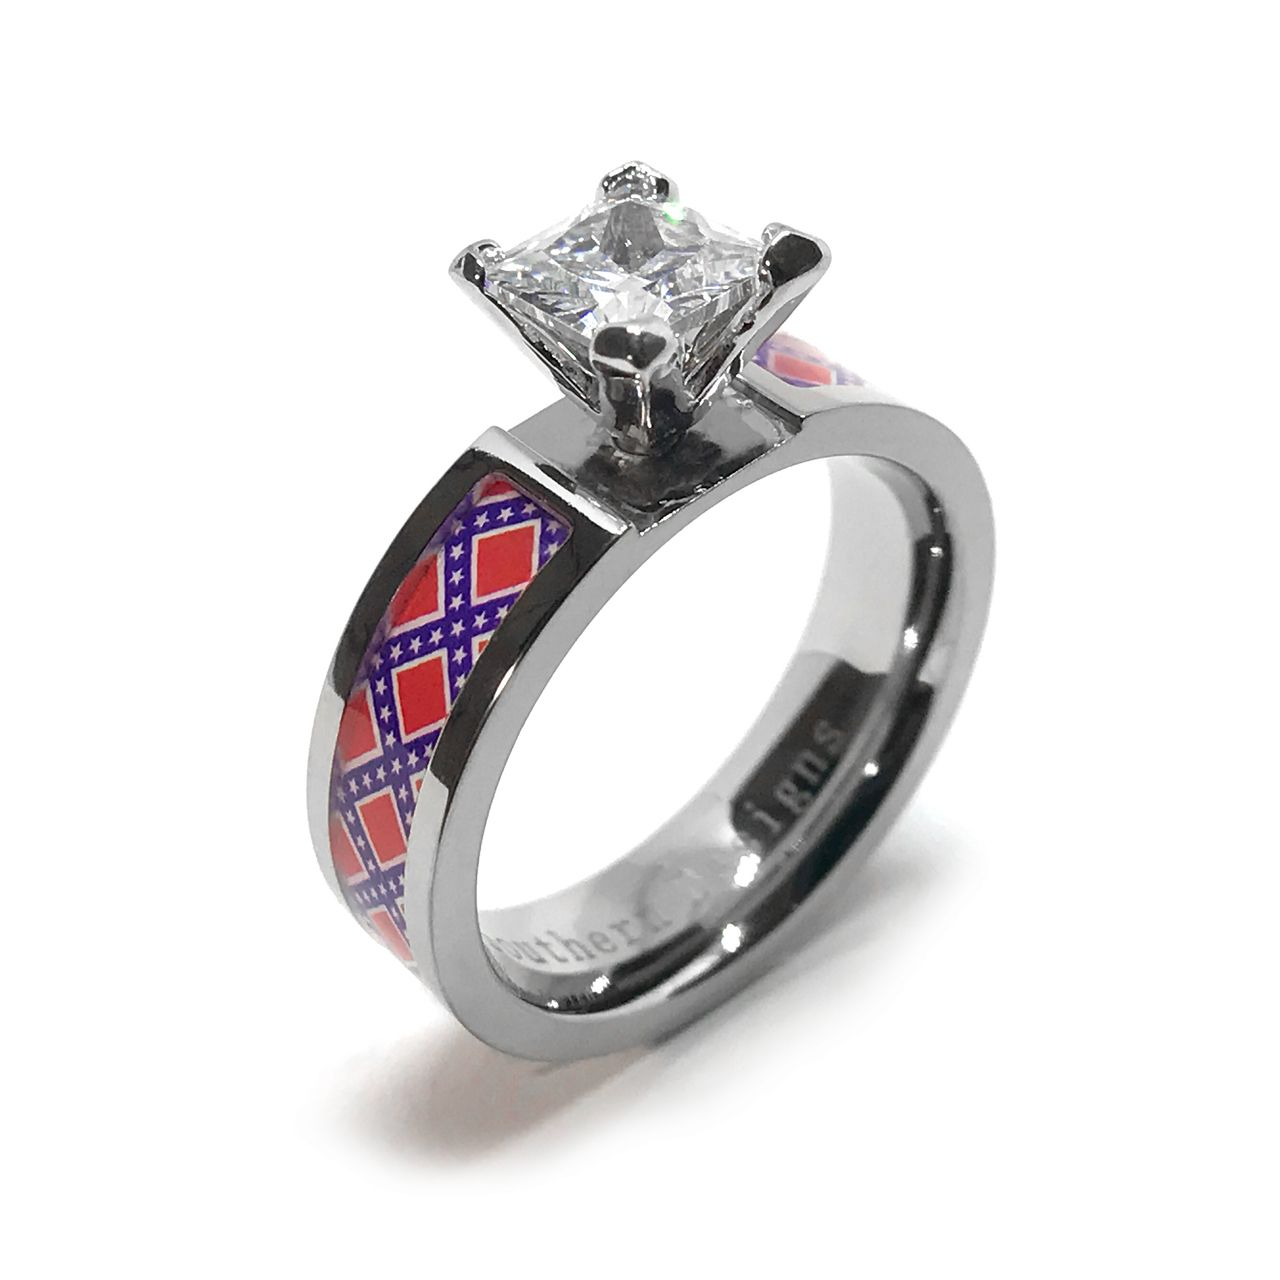 Rebel Flag Engagement Or Wedding Ring